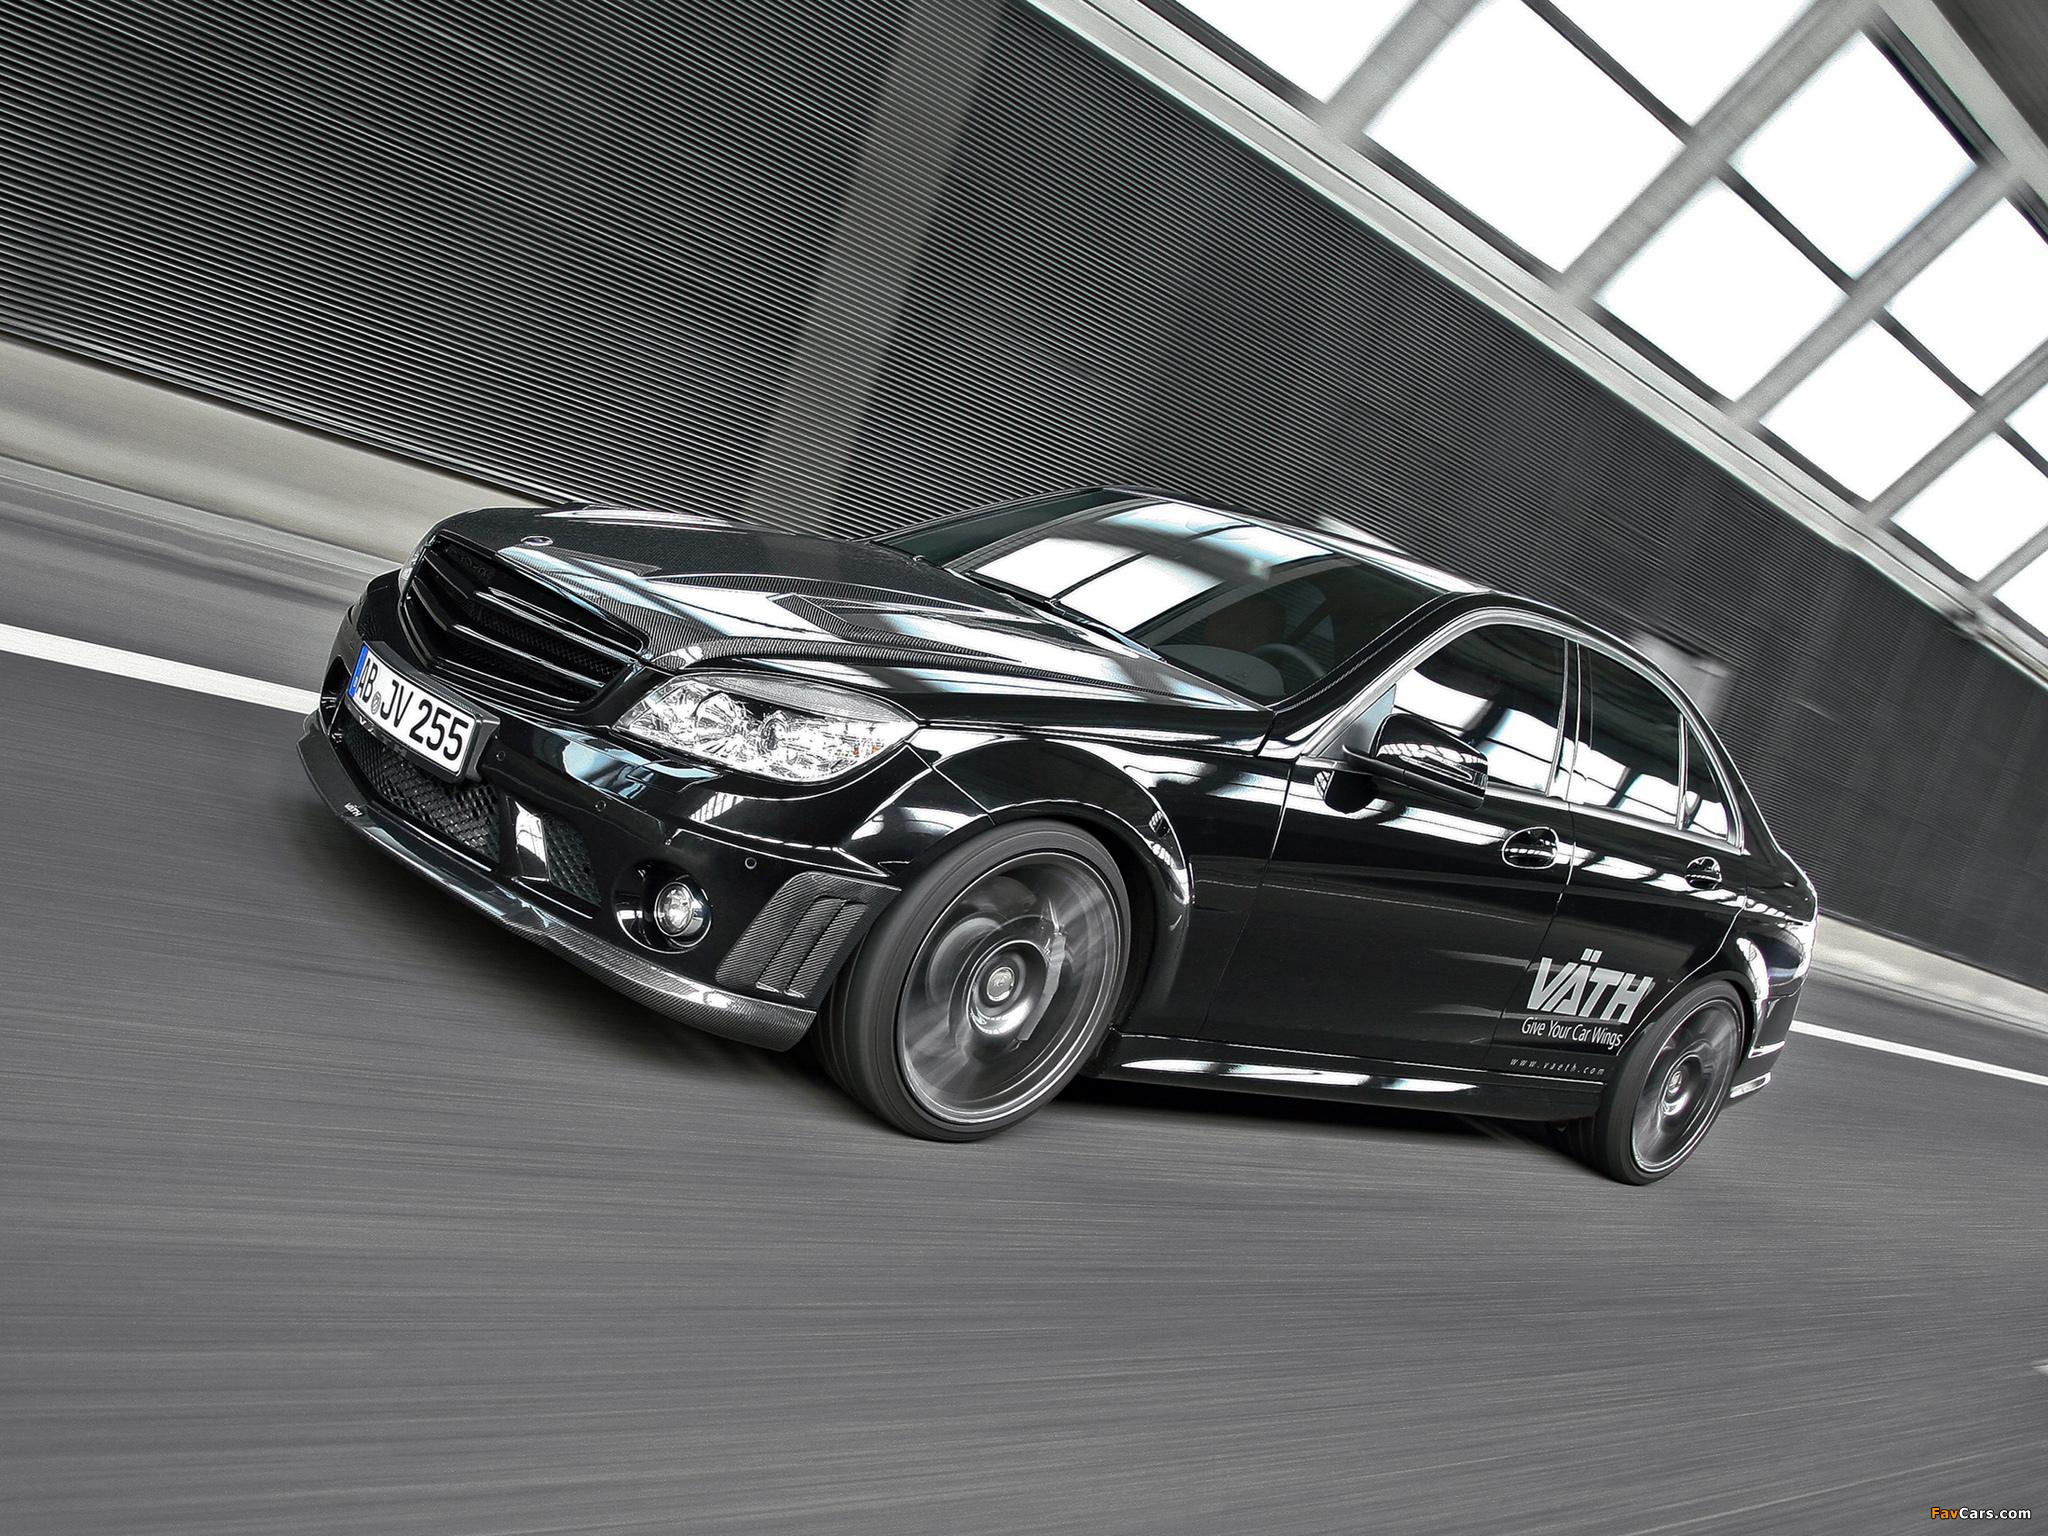 VÄTH Mercedes-Benz C 250 CGI (W204) 2010 images (2048 x 1536)